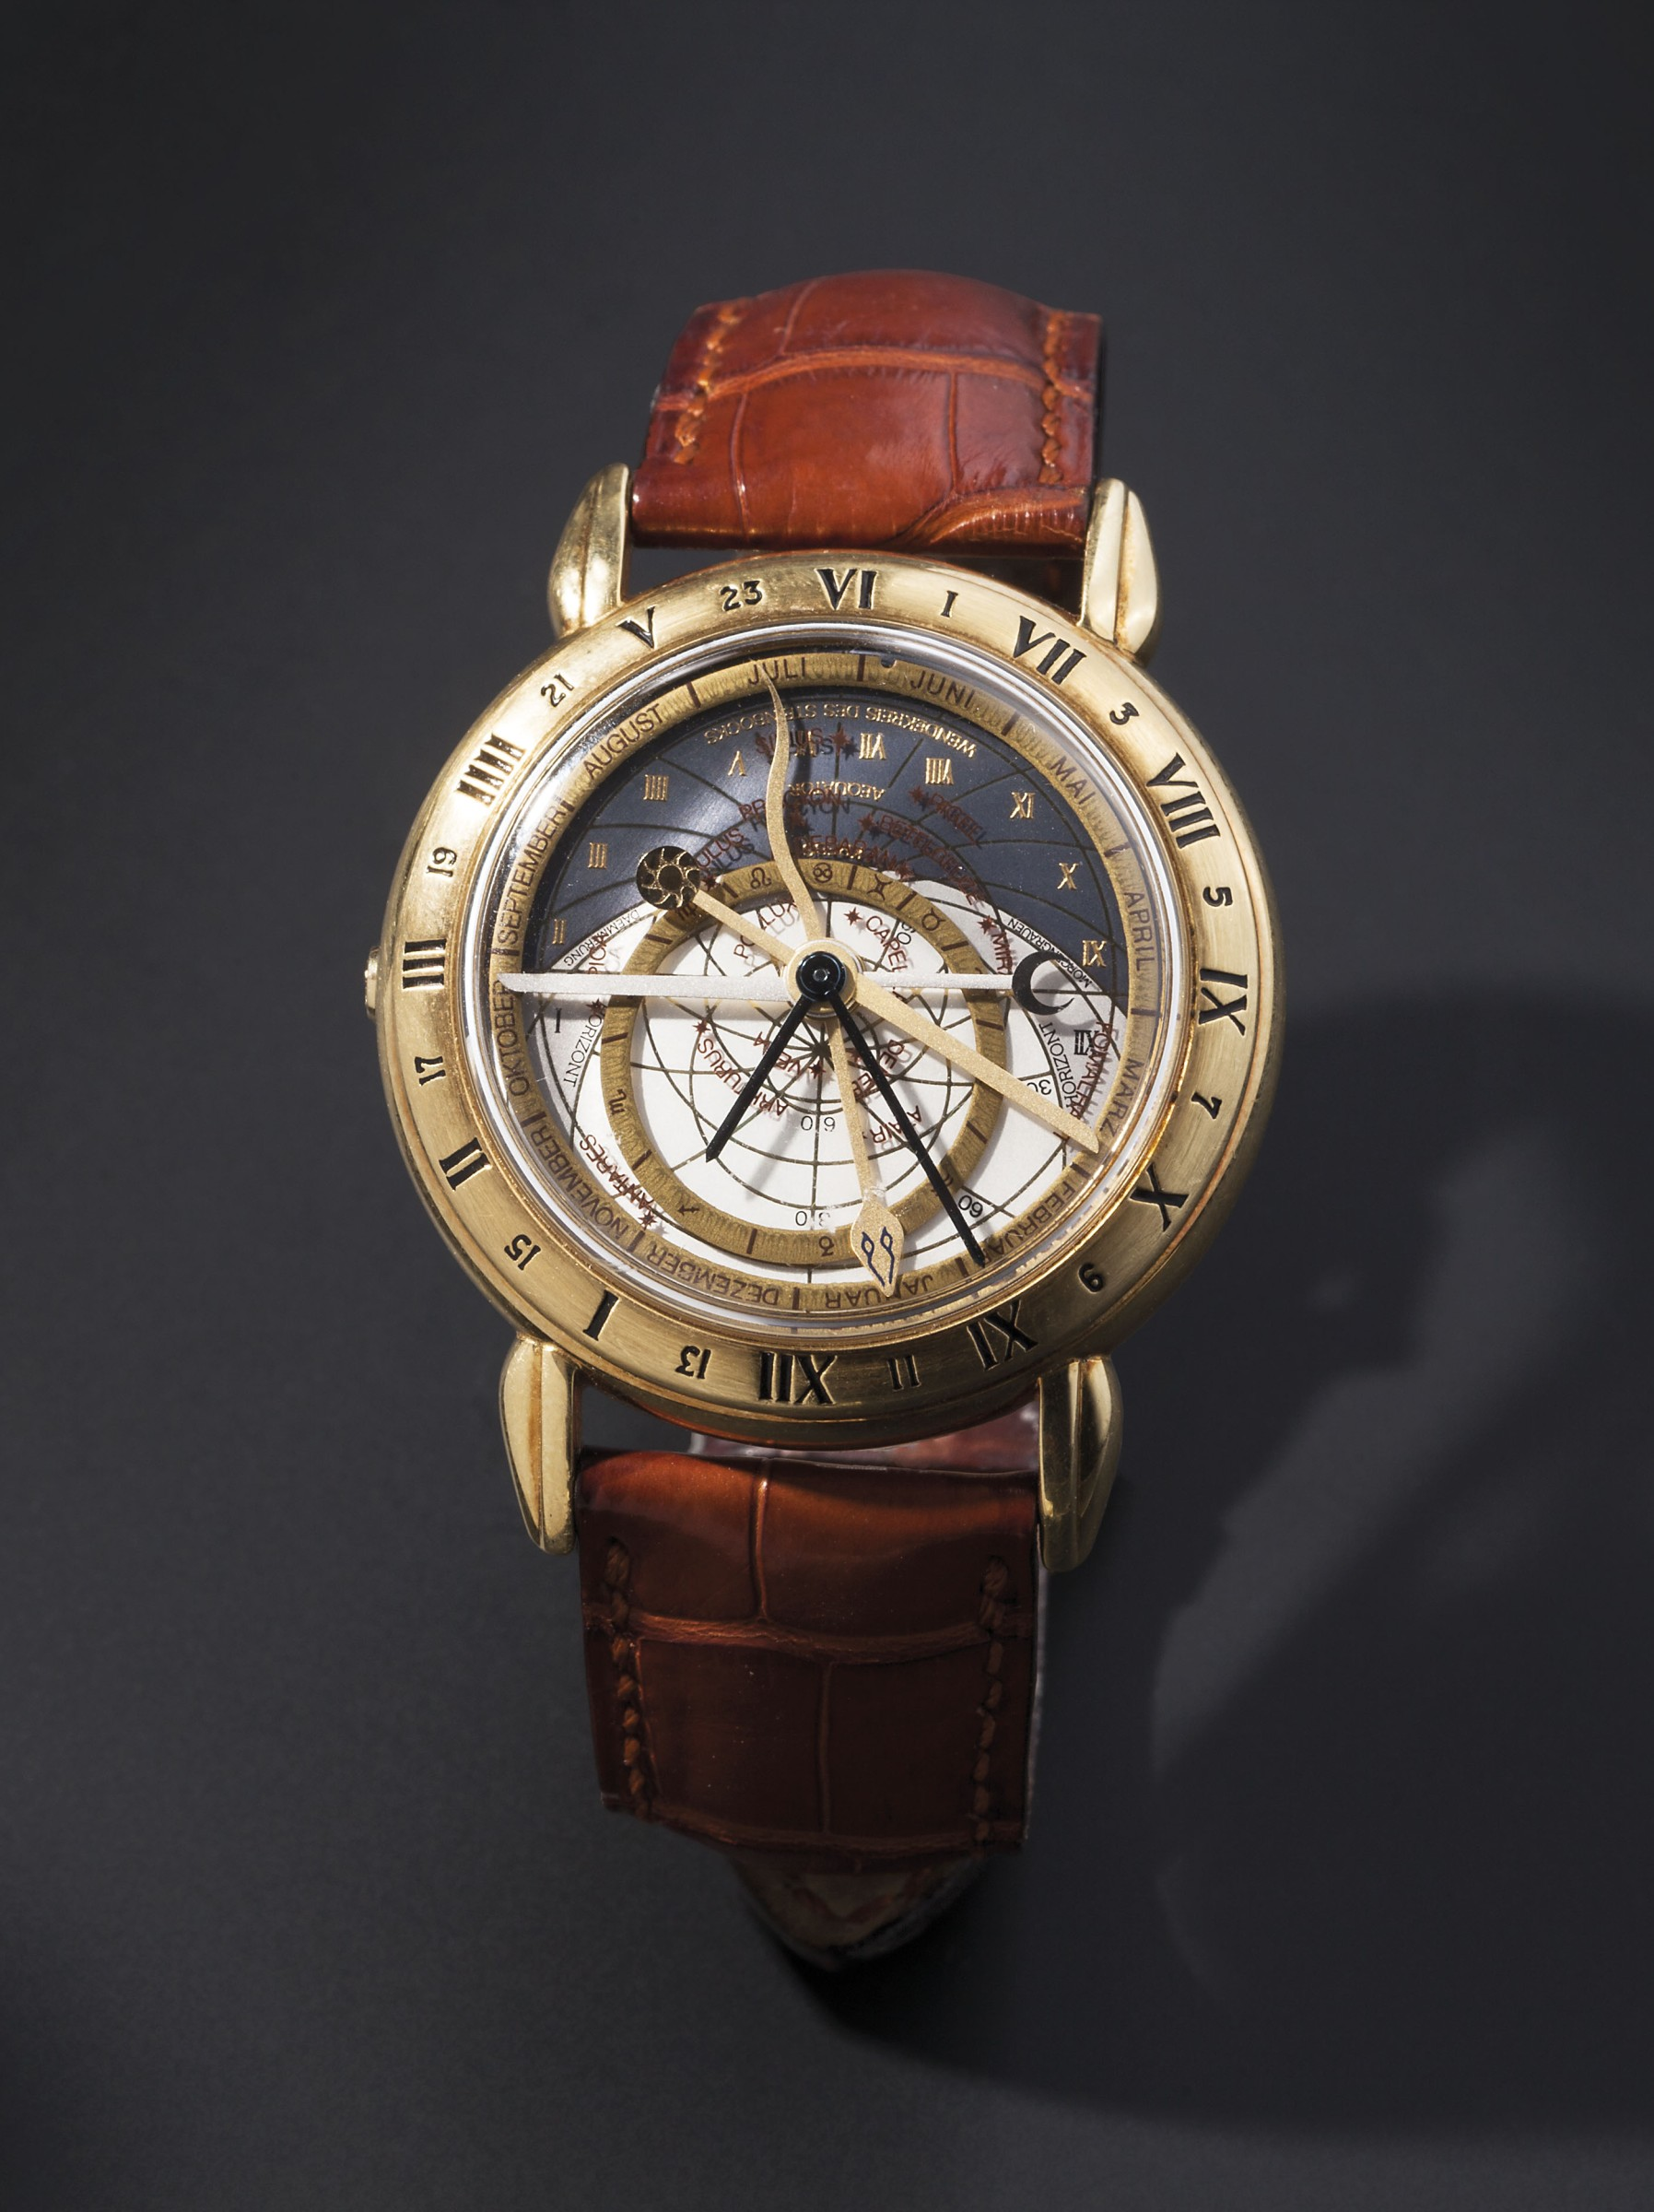 "ULYSSE NARDIN - Armbanduhr Modell ""Astrolabium Galileo Galilei"""